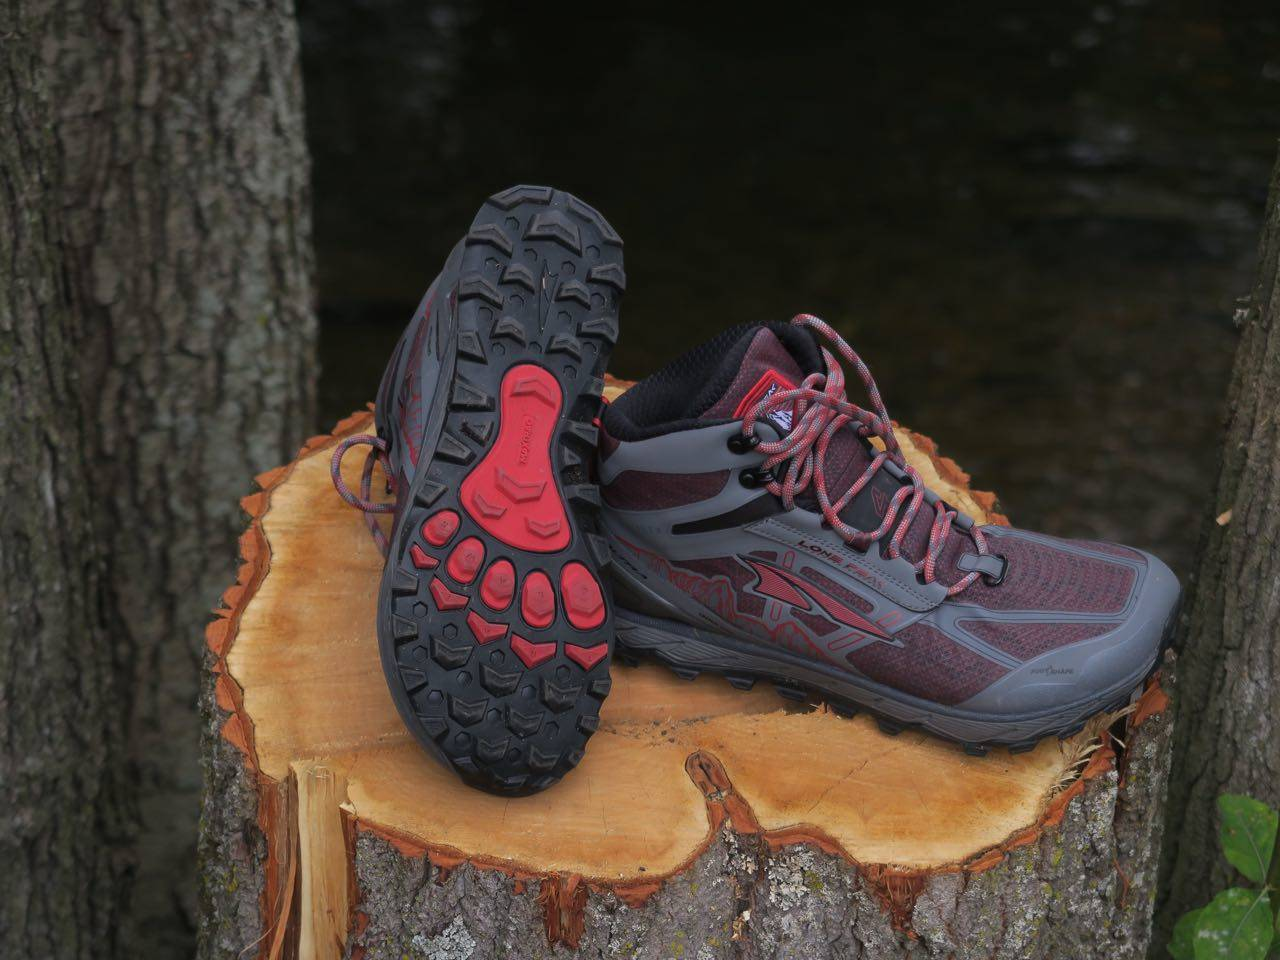 FOTFORM: Altra-sko har såkalt foot shape - bred forfot som lar tærne sprike naturlig for naturlig demping og bedre stabilitet.